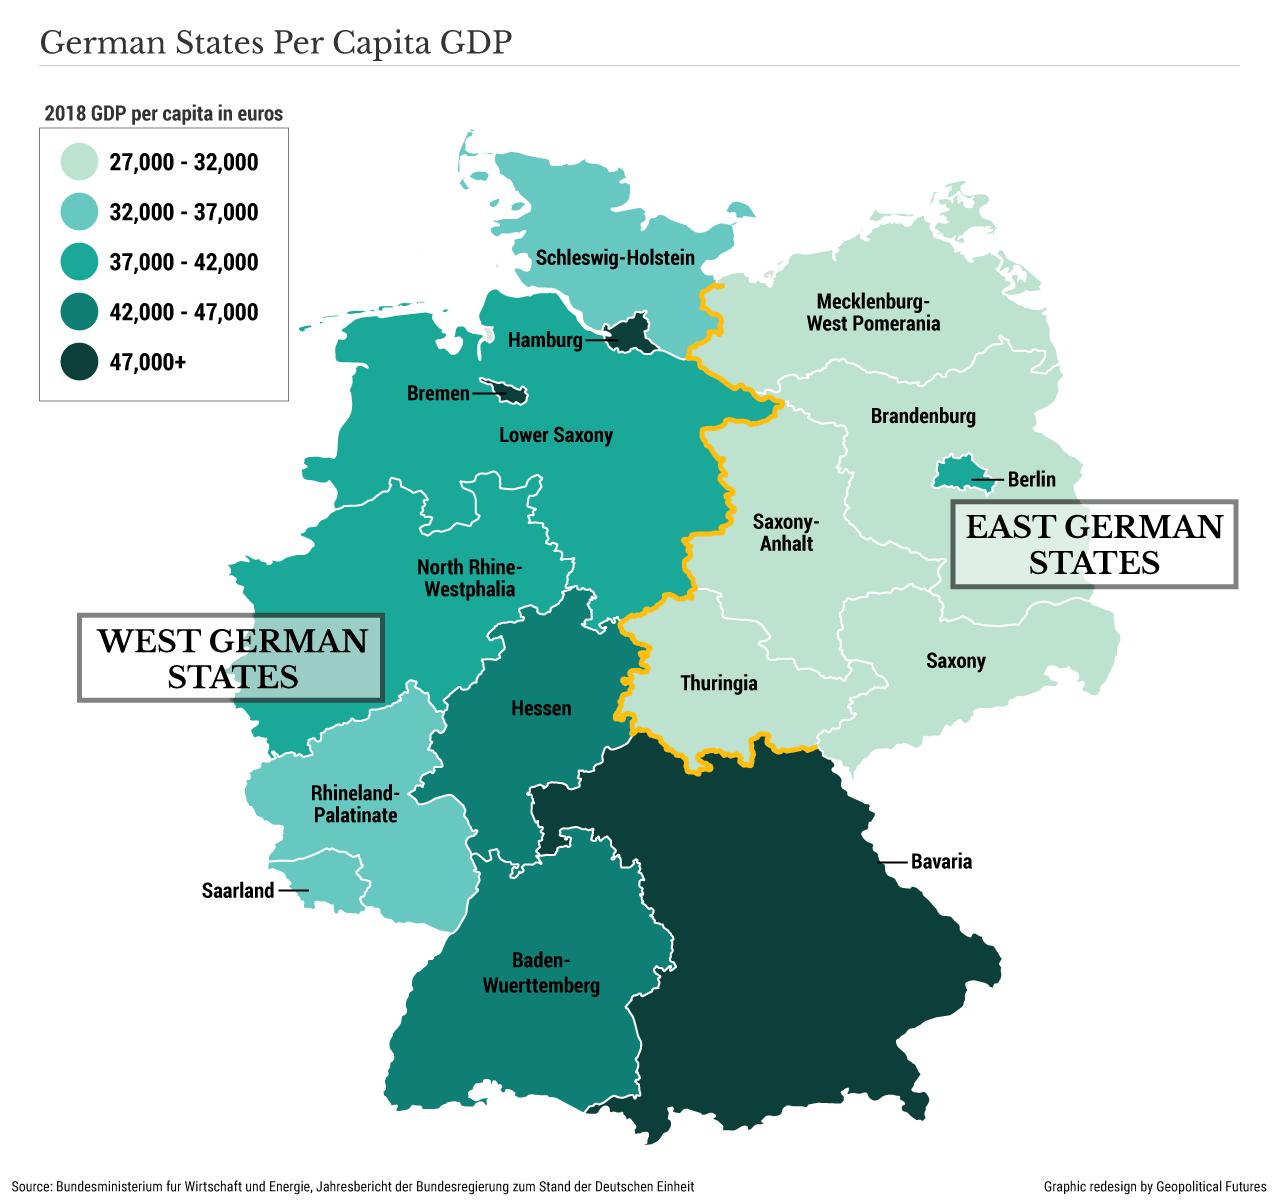 German States Per Capita GDP